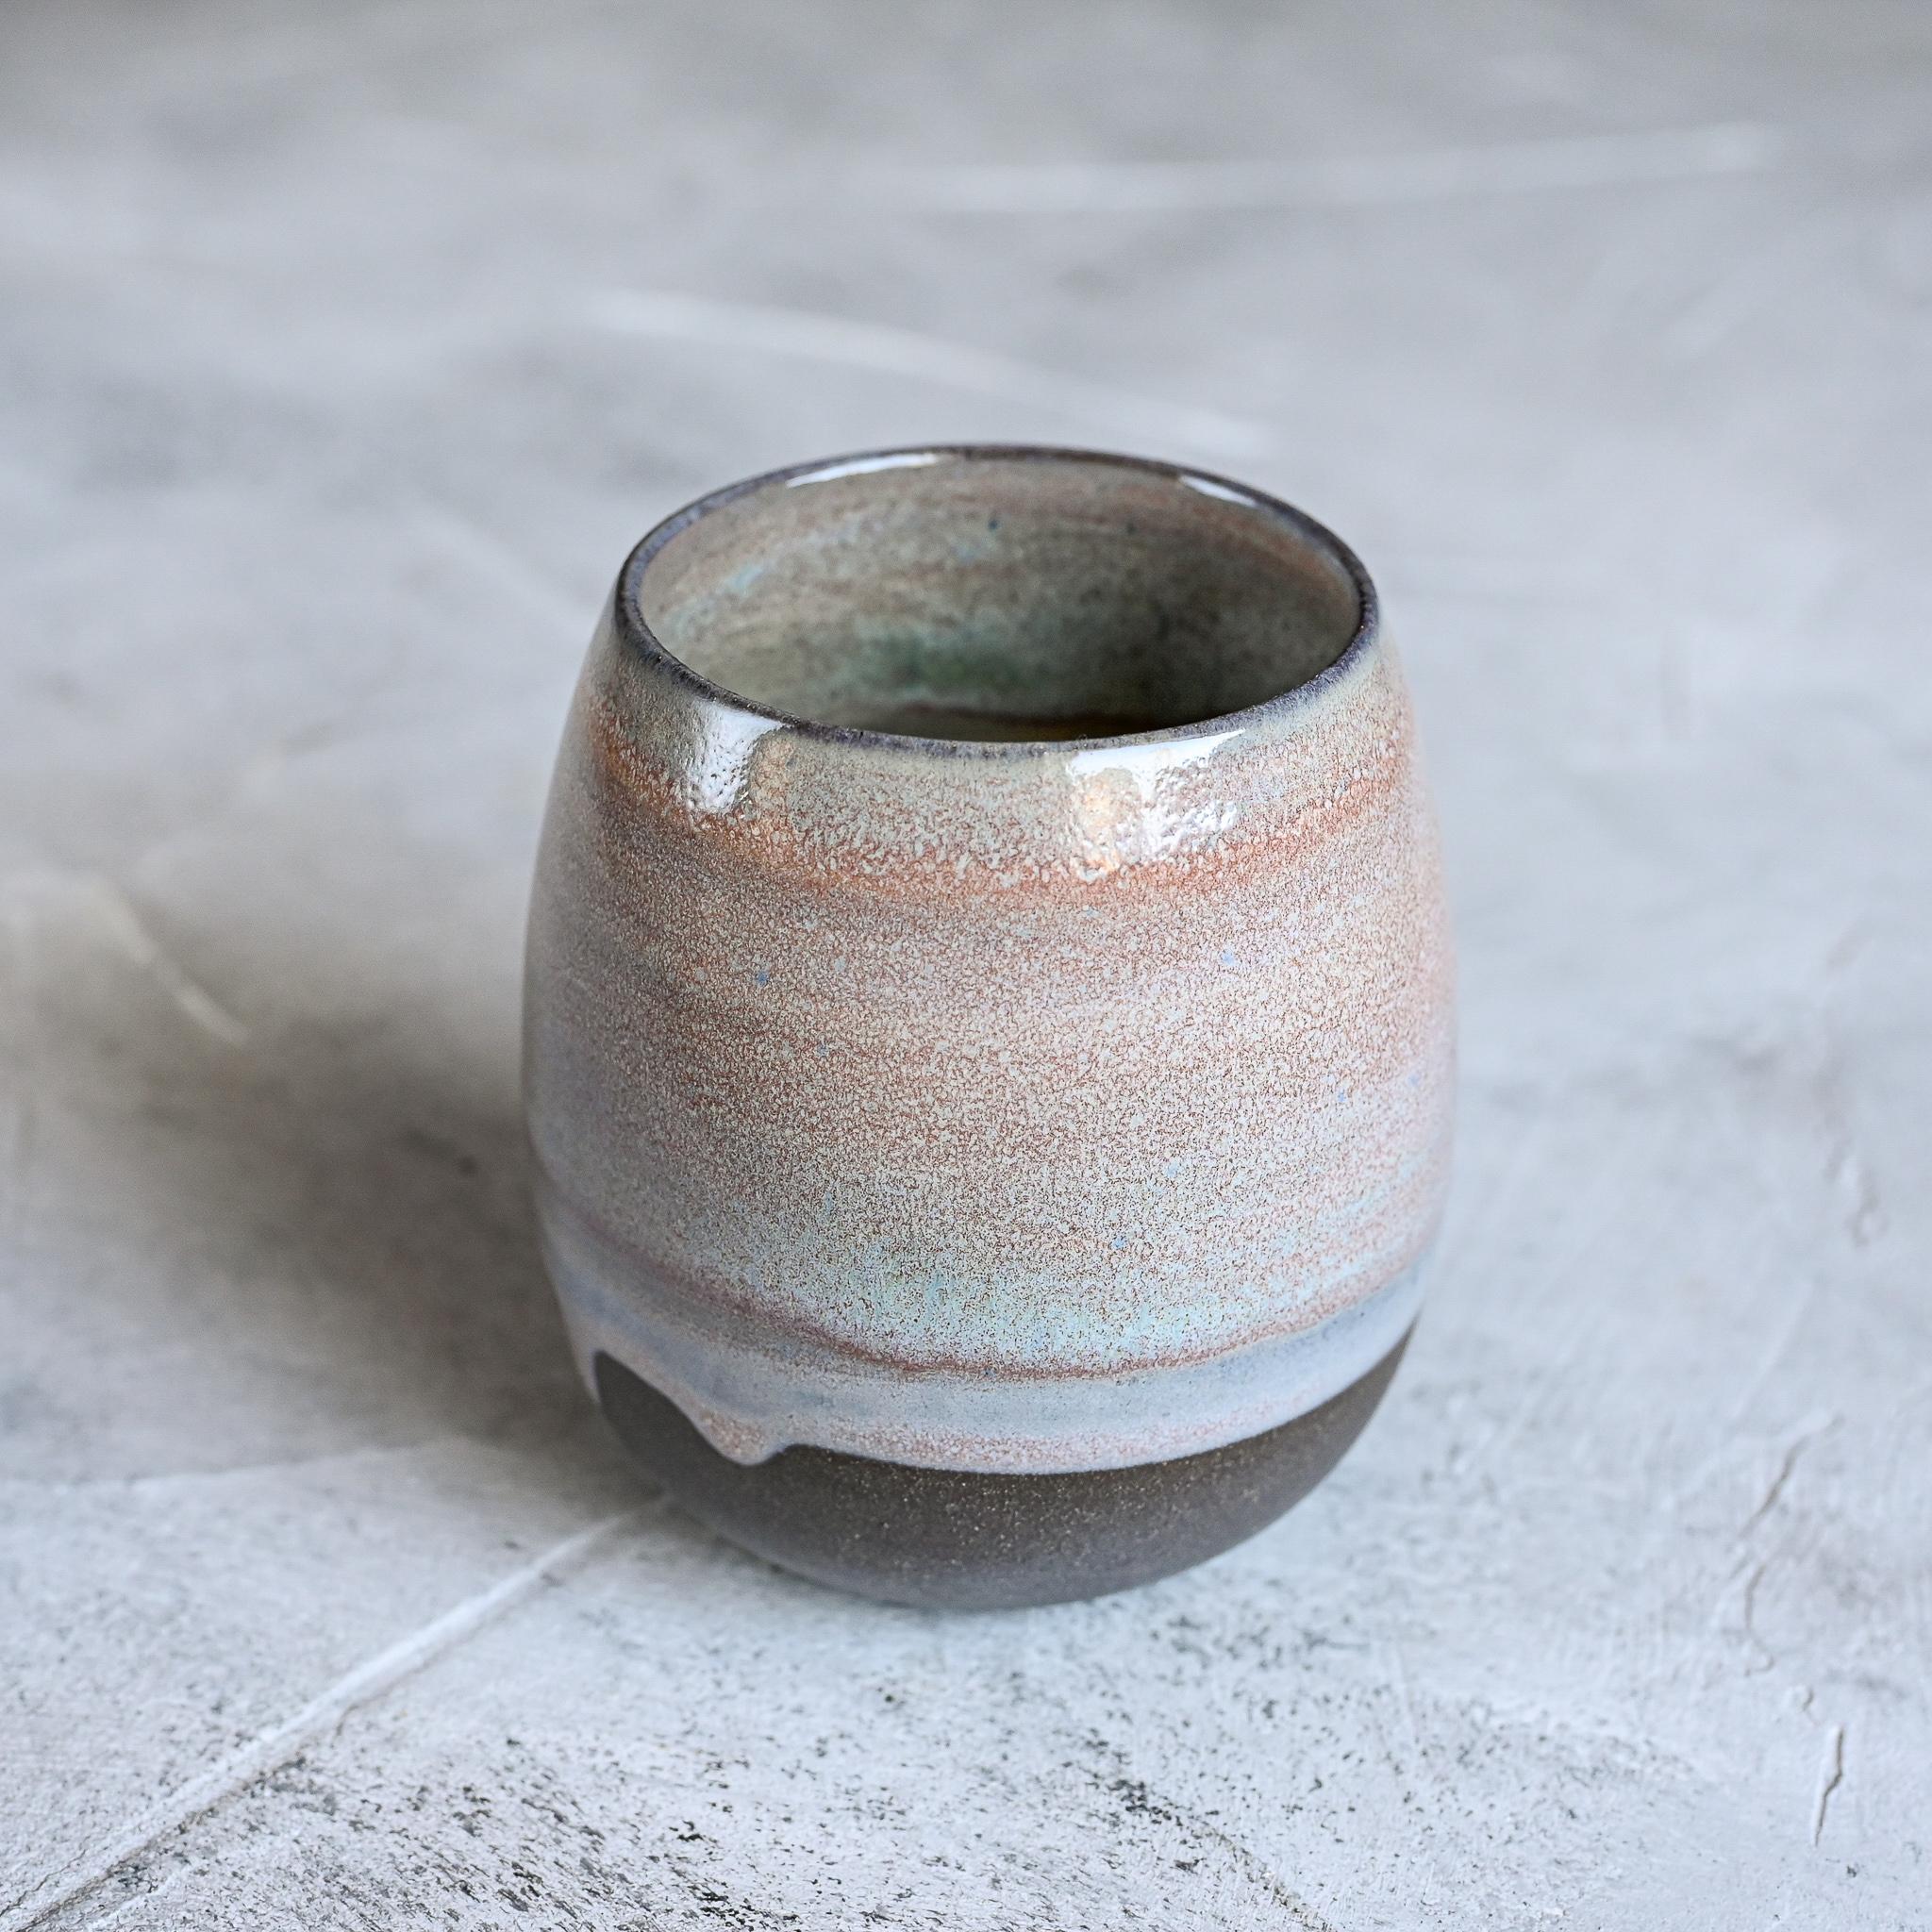 картинка Керамический стакан Марии Левиной малый 4 - DishWishes.Ru